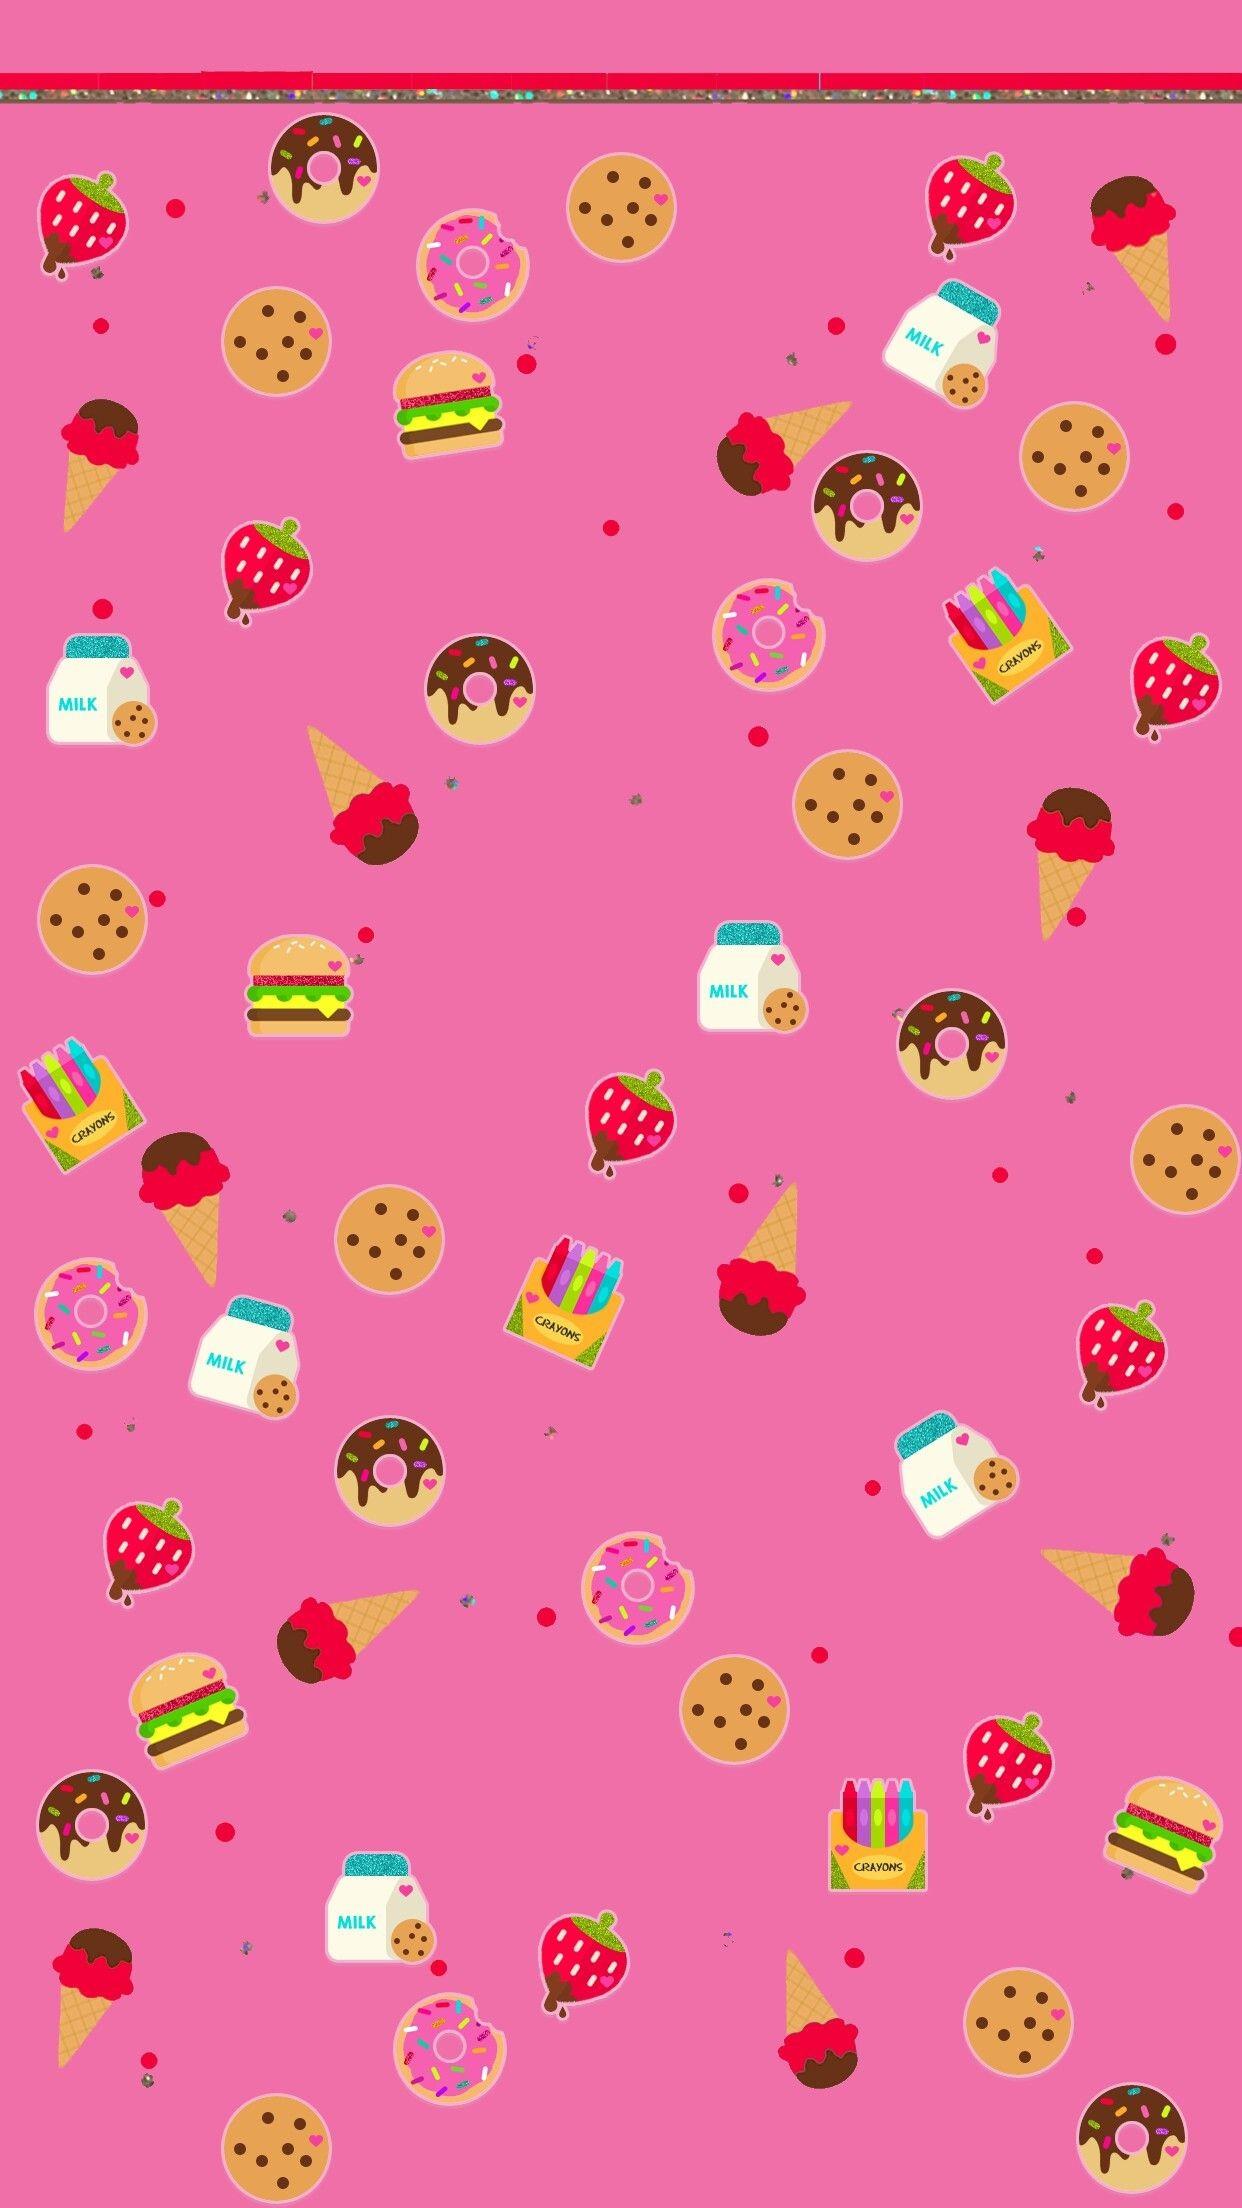 Res: 1242x2208, Kawaii Wallpaper, Wallpaper Art, Cute Wallpapers, Iphone Wallpapers,  Cellphone Wallpaper, Backrounds, Papo, Cupcakes, Images